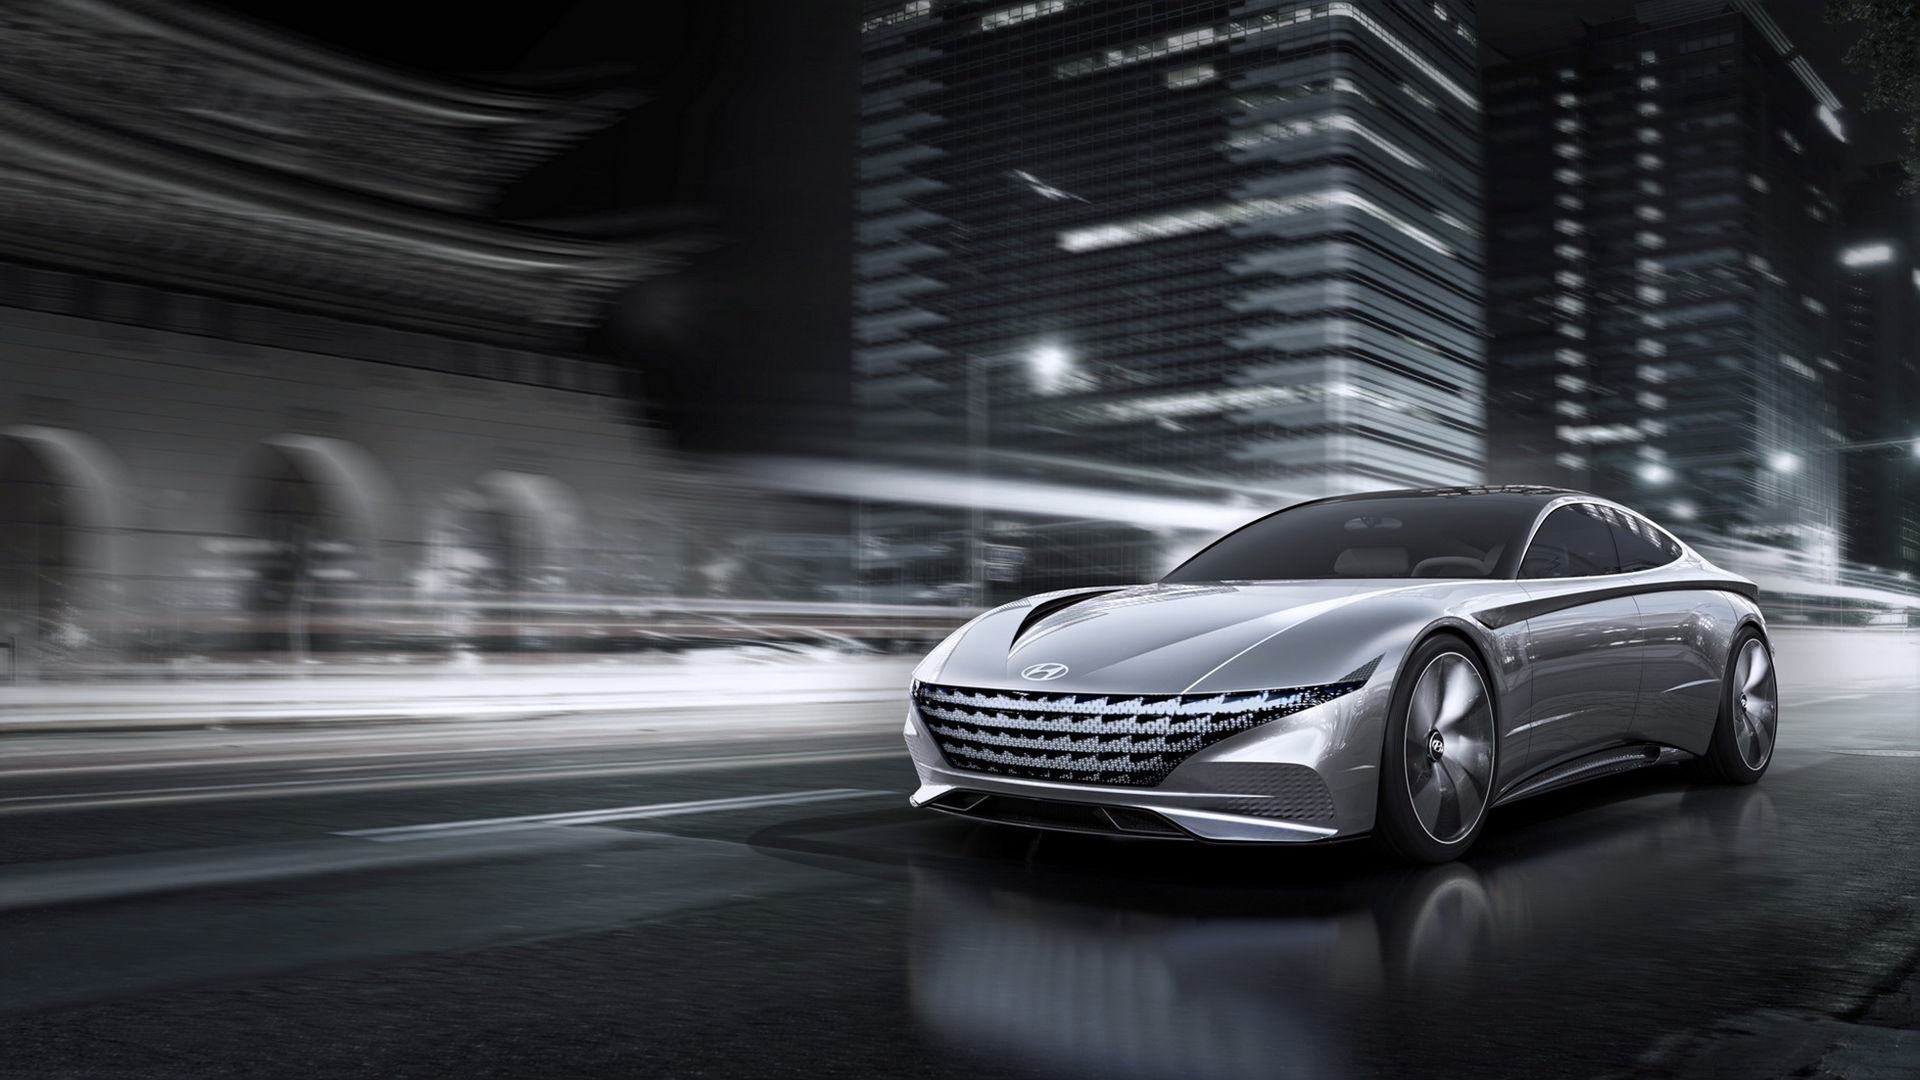 Le Fil Rouge - slank konceptbil från Hyundai